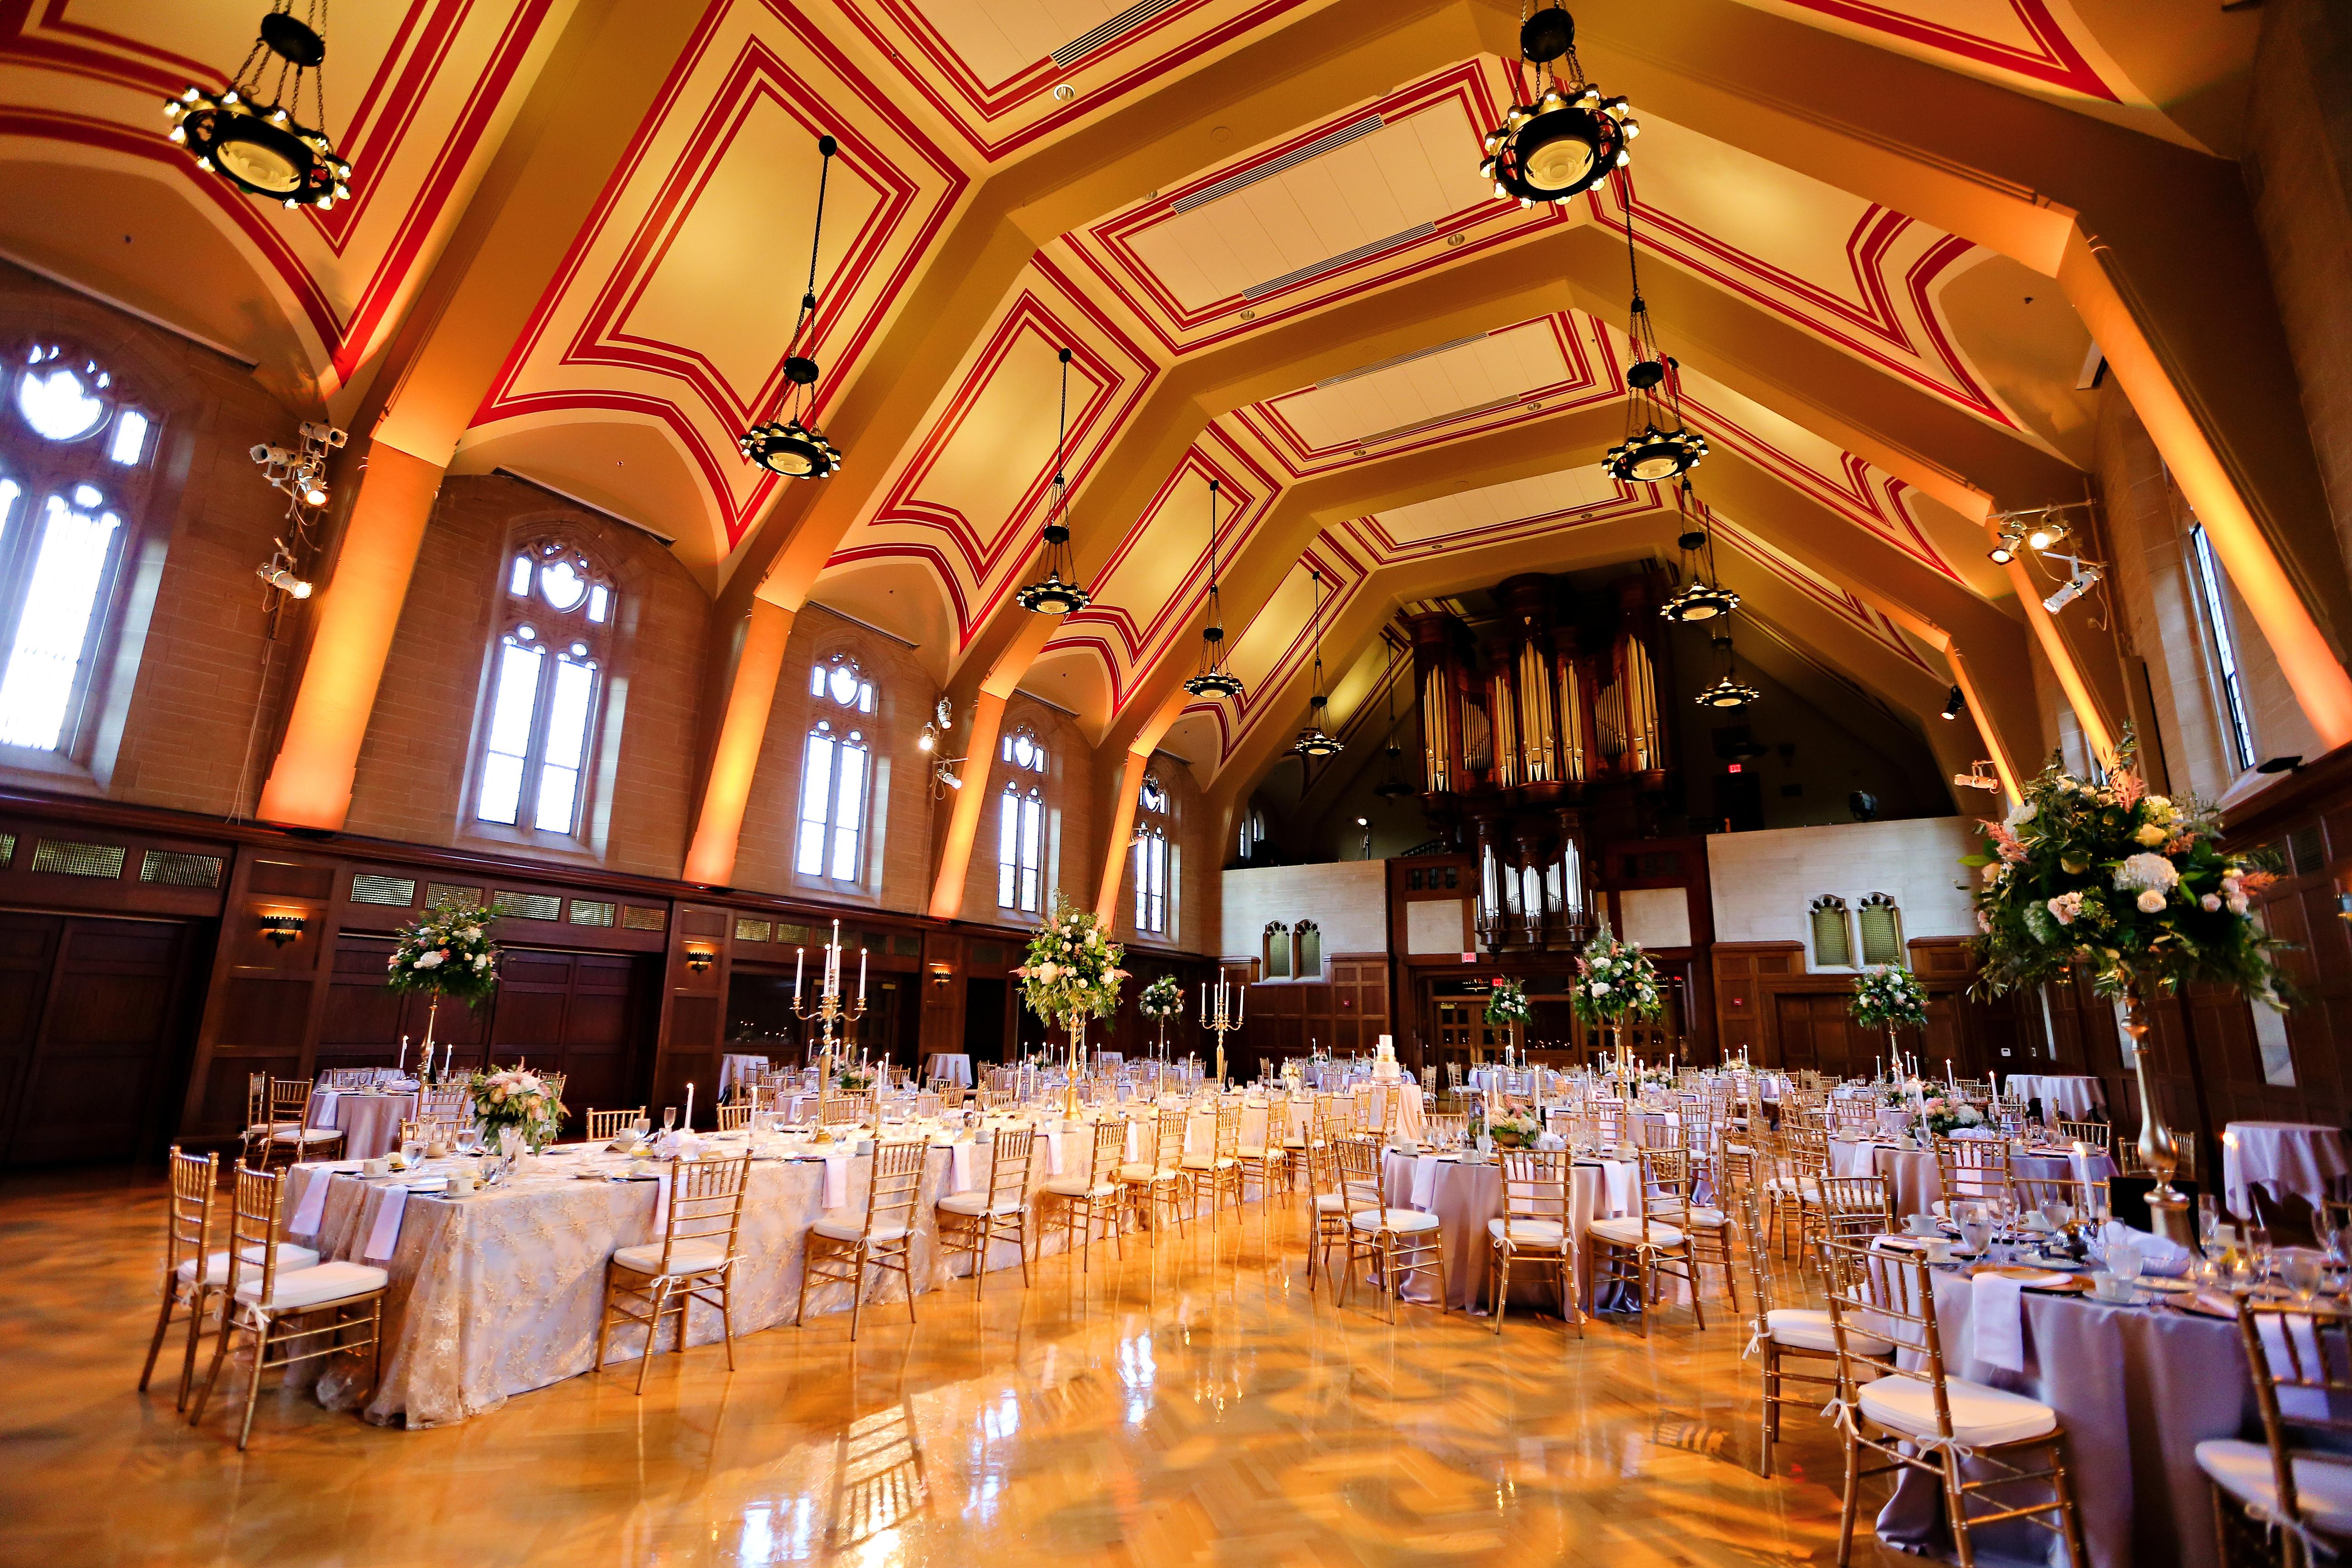 255 meaghan matt indiana university wedding